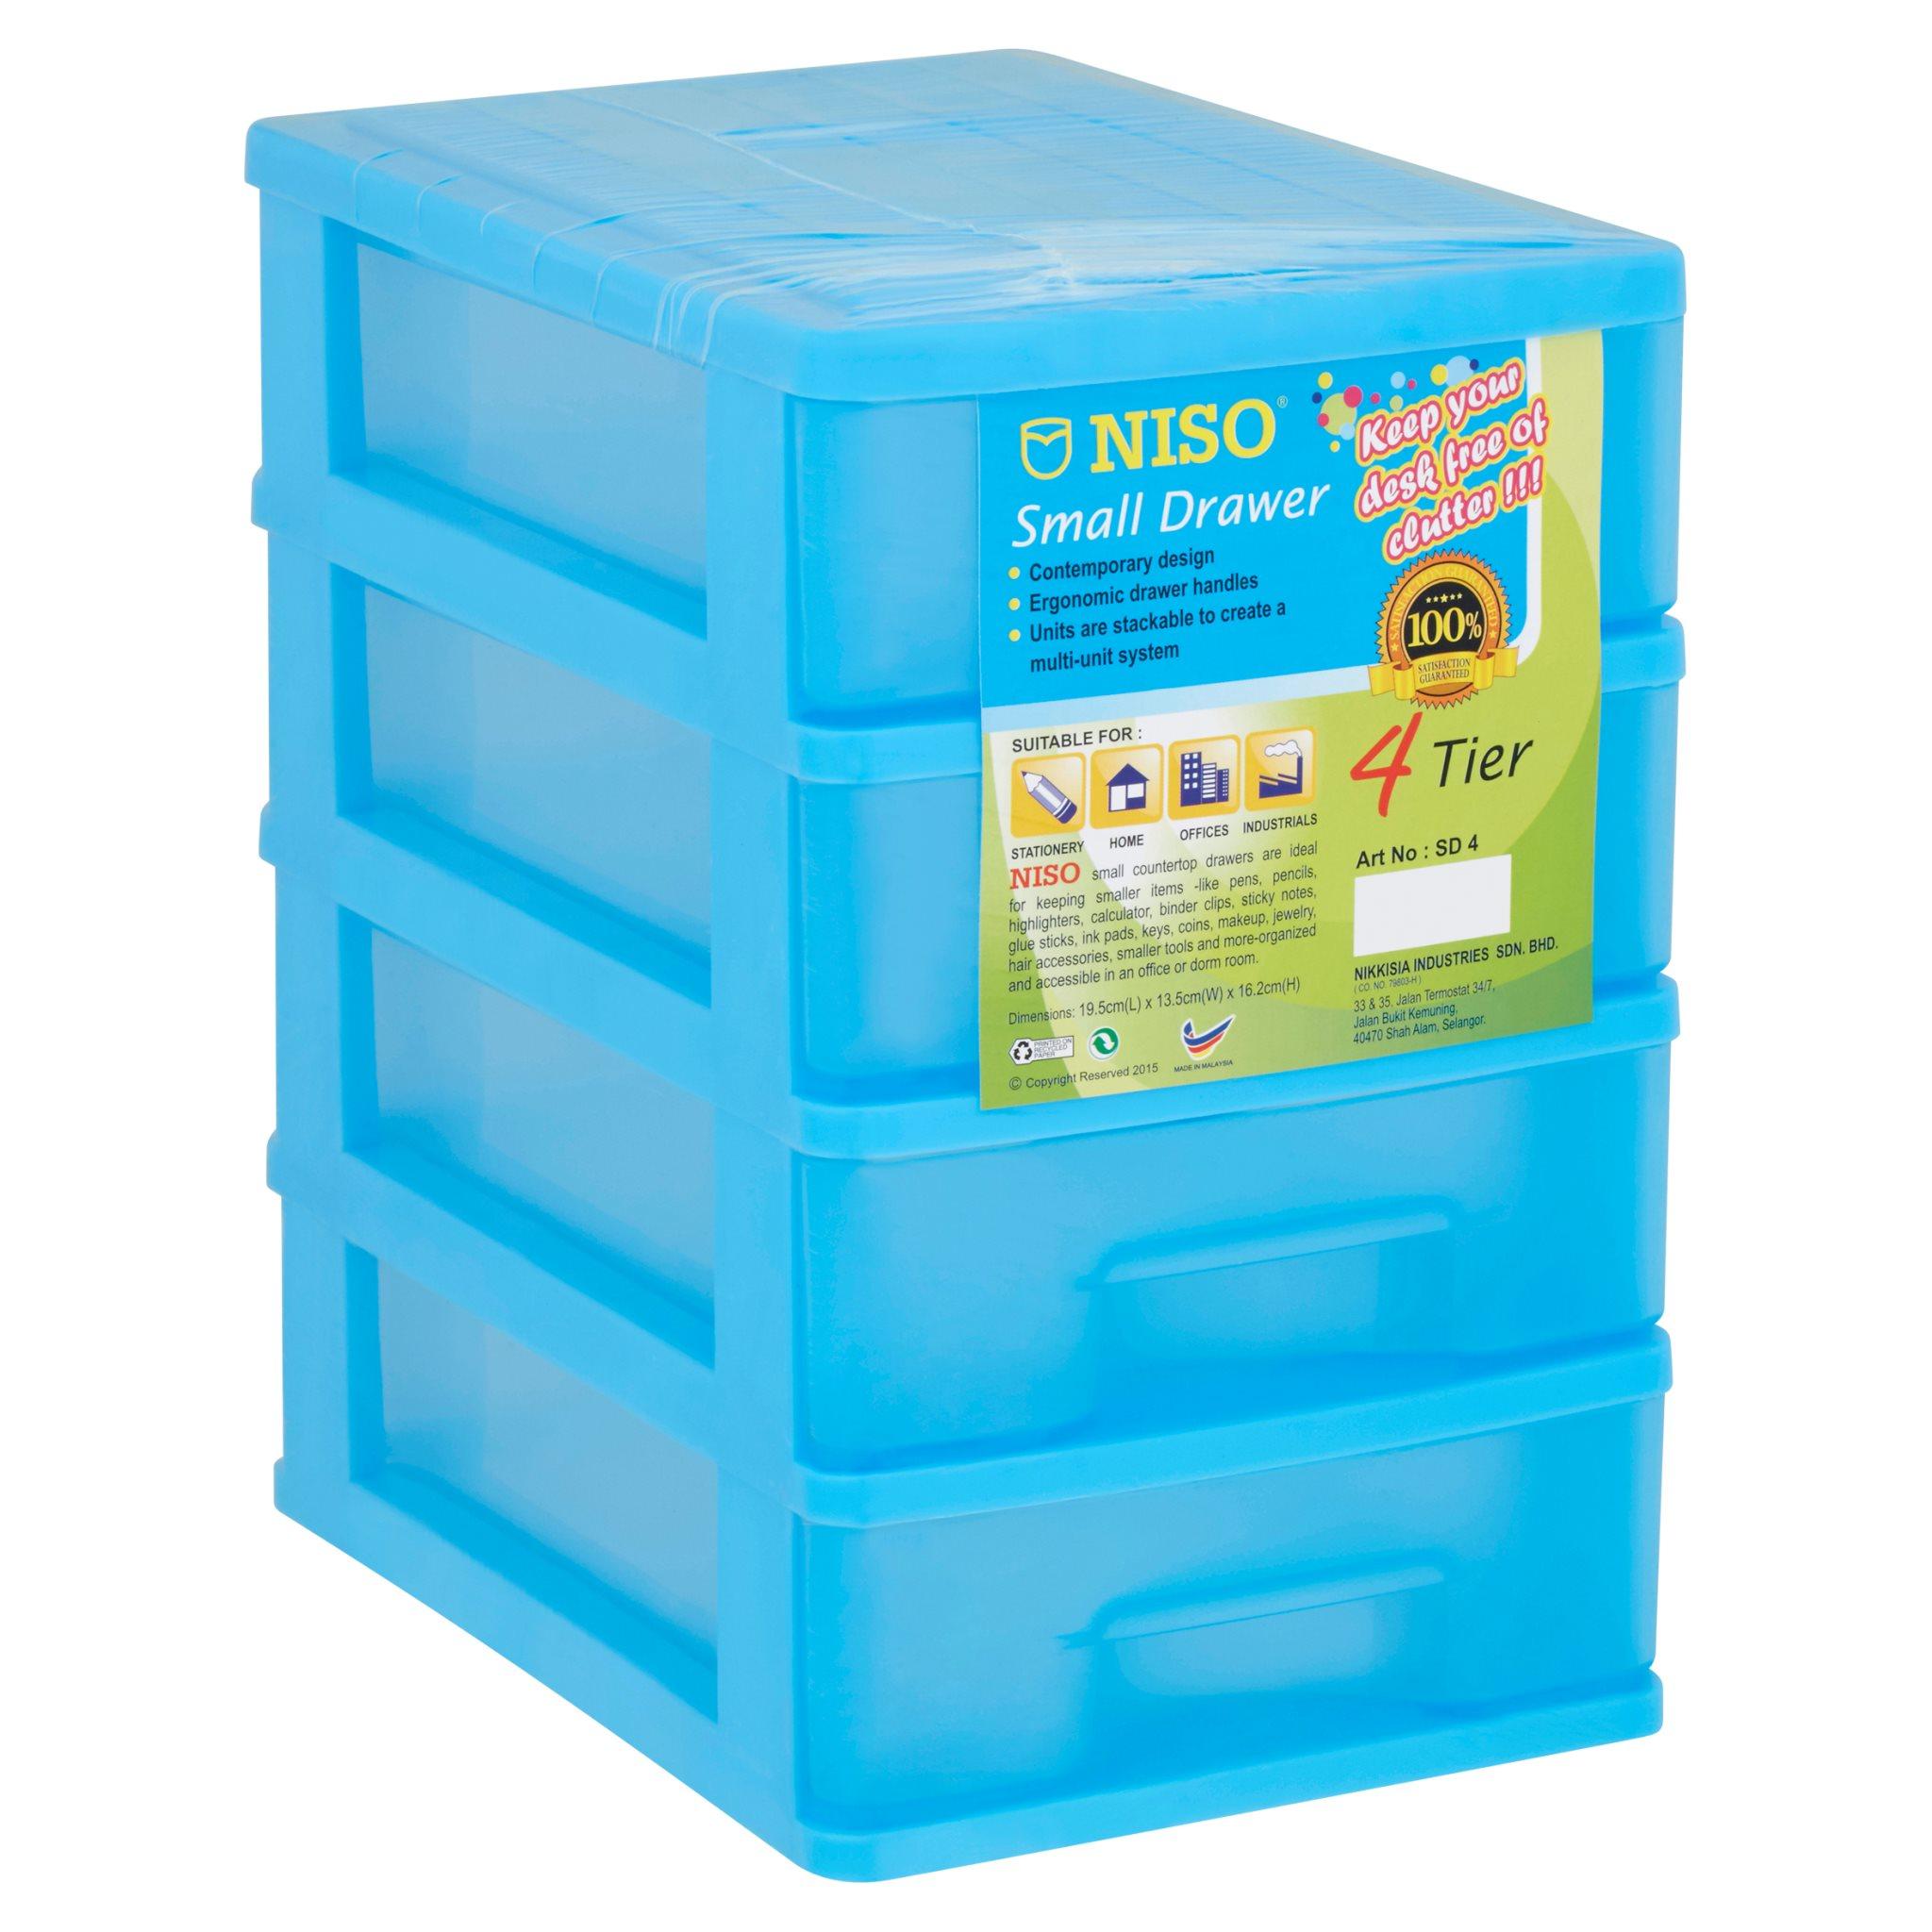 Niso Mini Drawer 4 Tier SD4